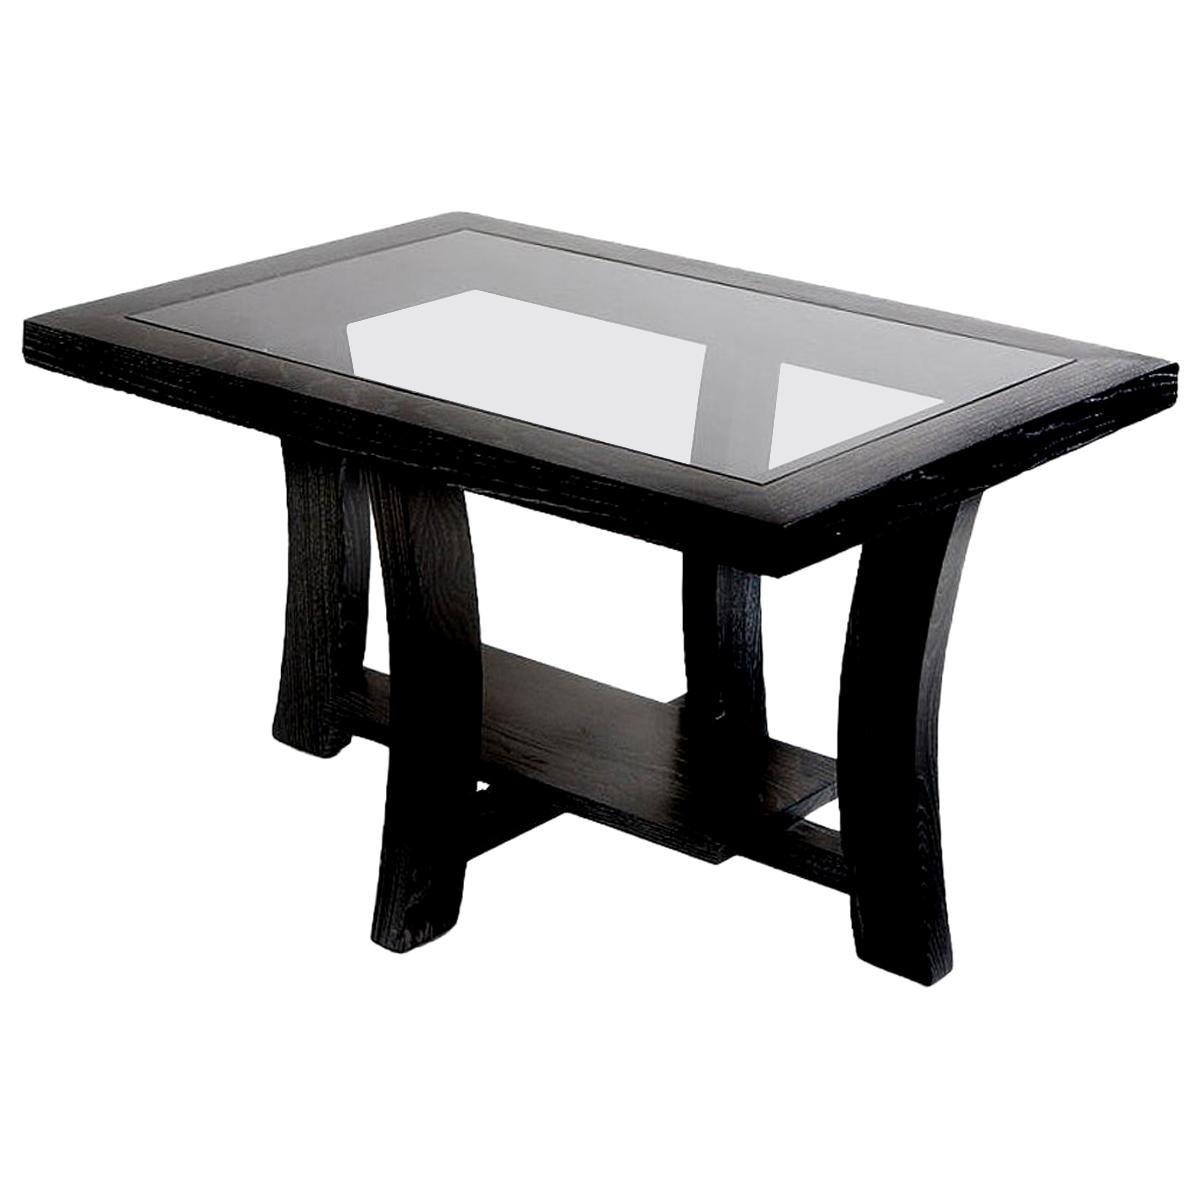 Paul Frankl Black Stepped Side Table for Brown Saltman